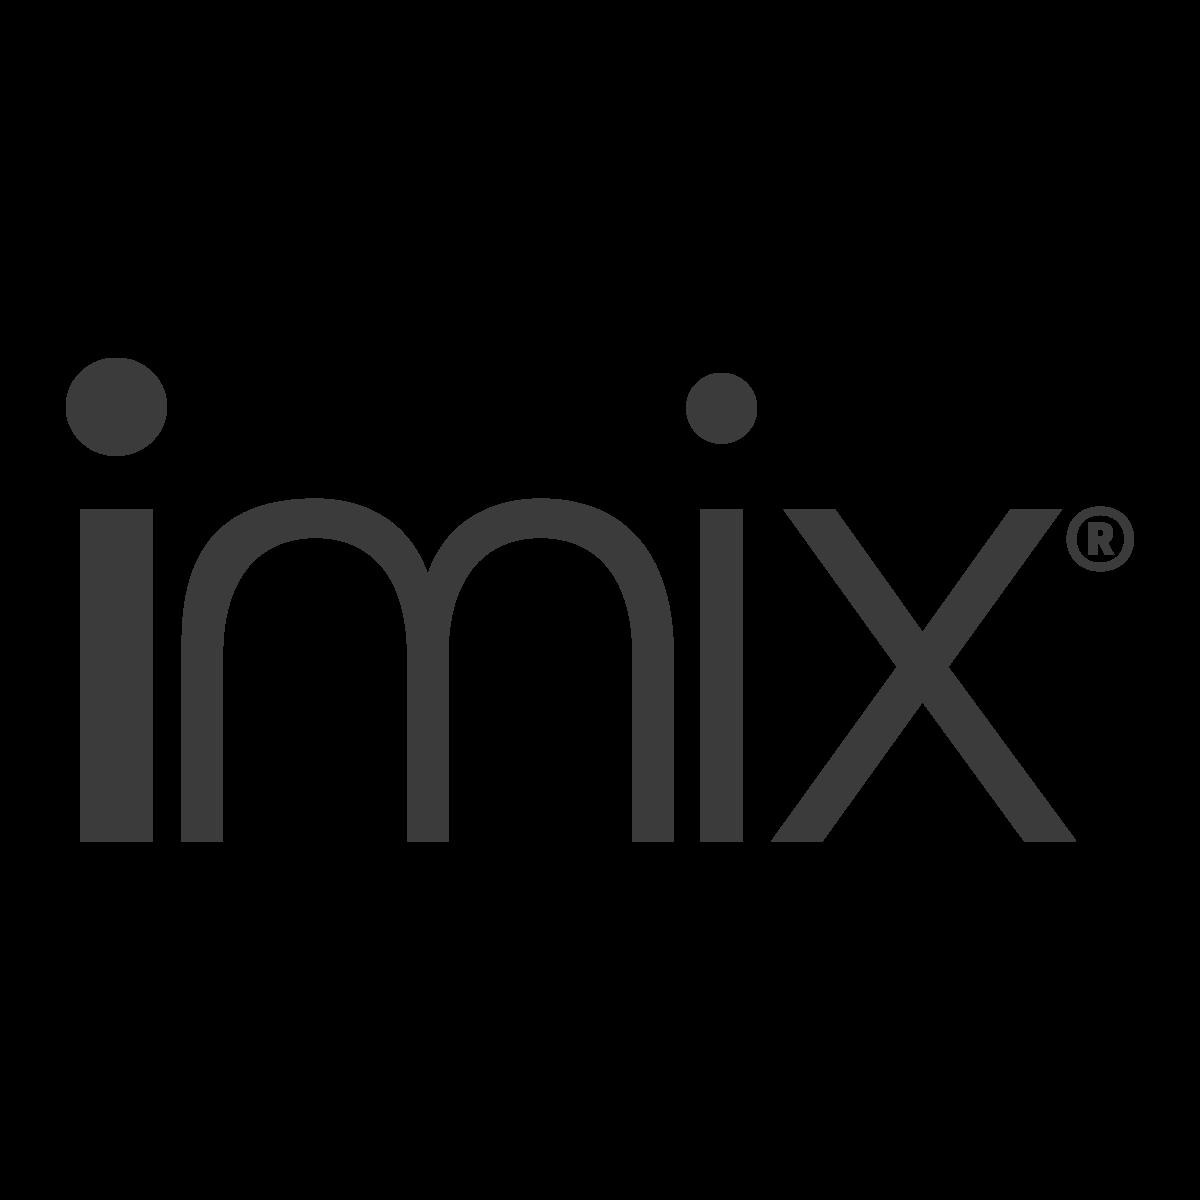 imix brand logo